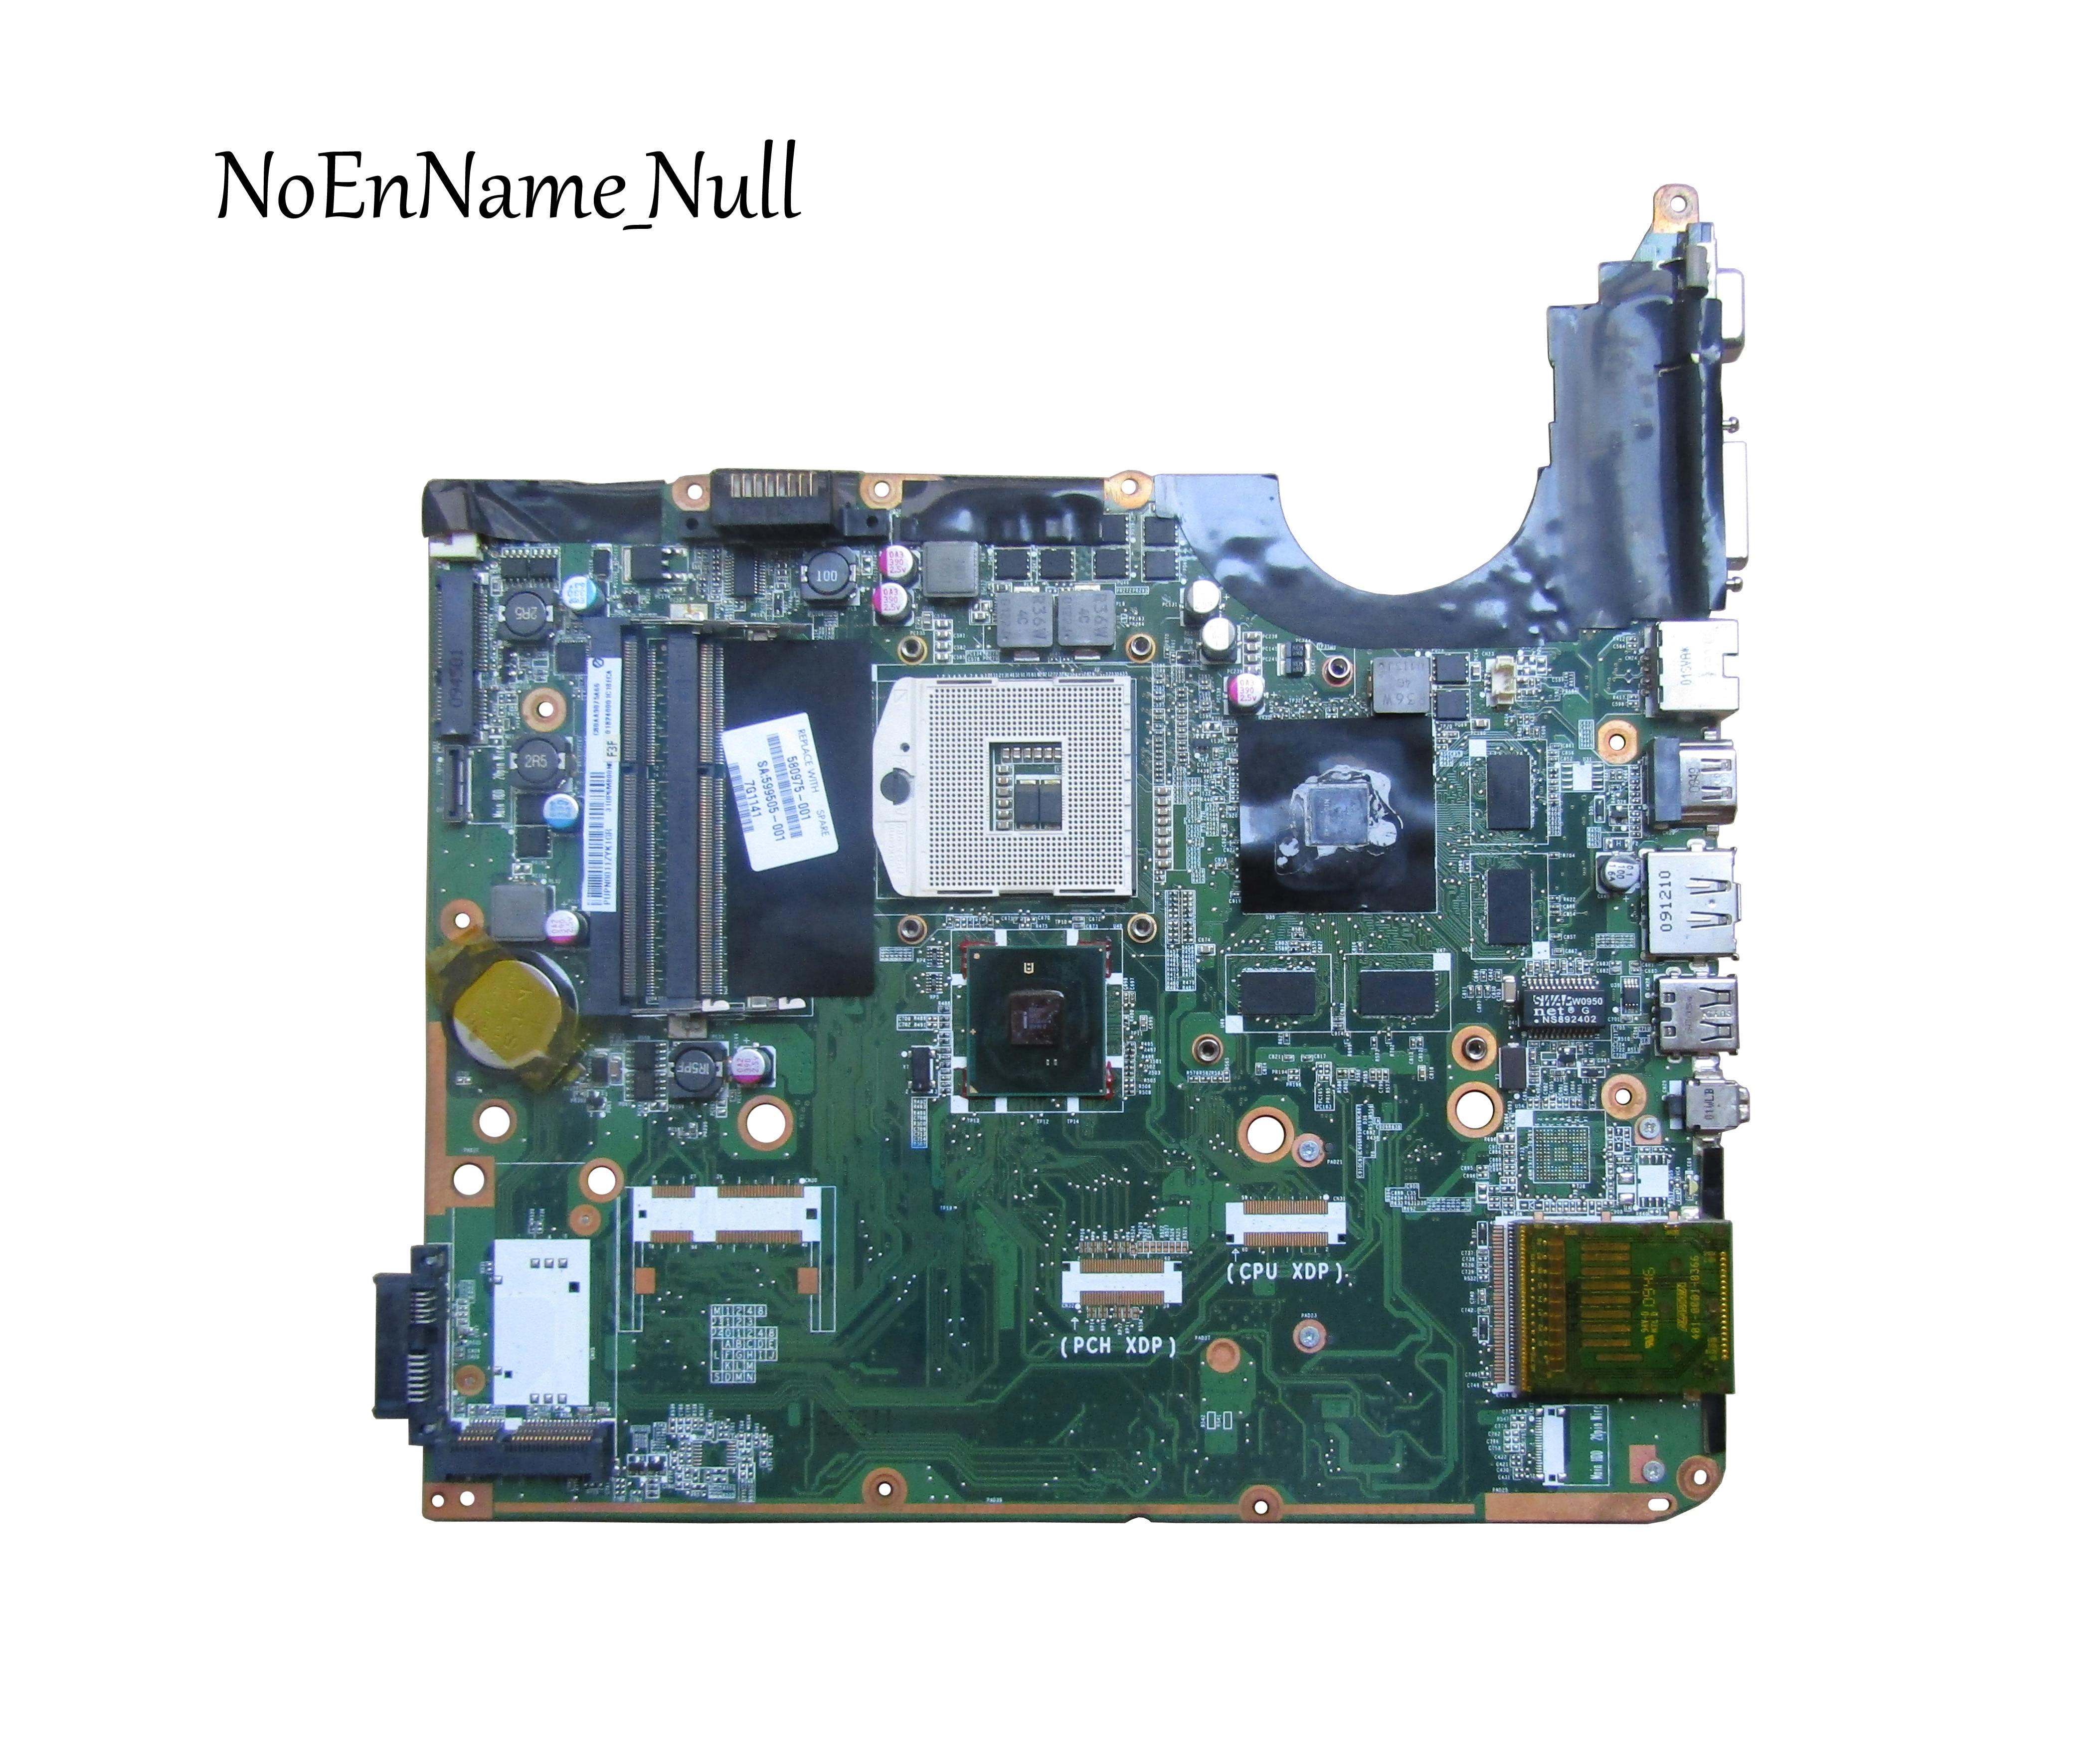 580975-001 Free Shipping Laptop Motherboard For HP Pavilion DV6 DV6-2000 Motherboard DA0UP6MB6F0 PM55 DDR3 GT230M